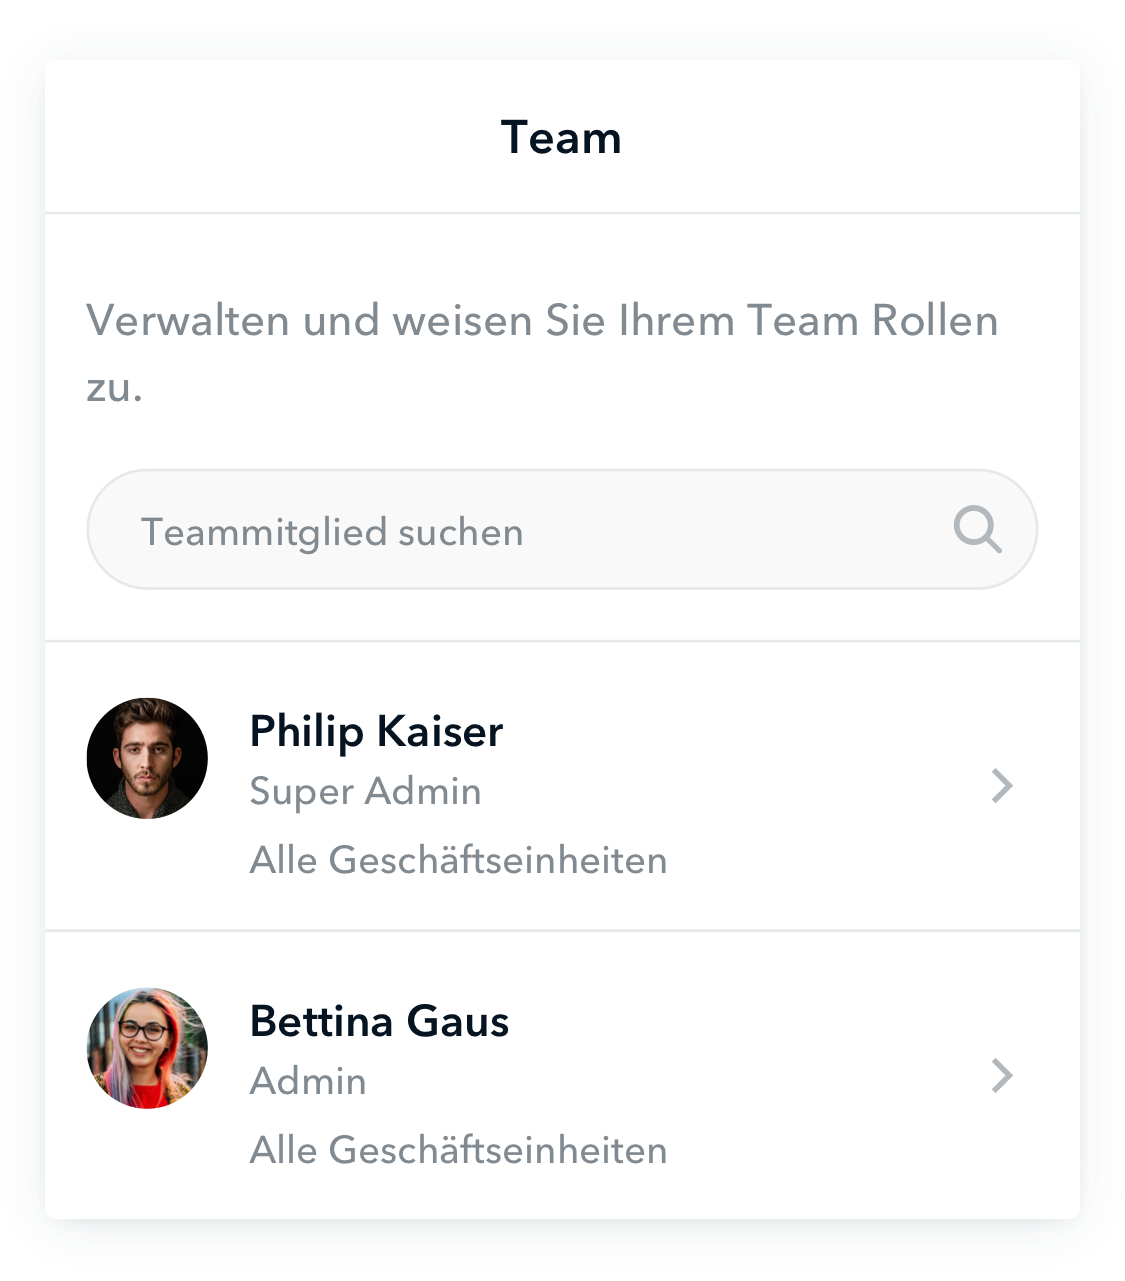 DE_sml_prod_core_team_mgmt_02